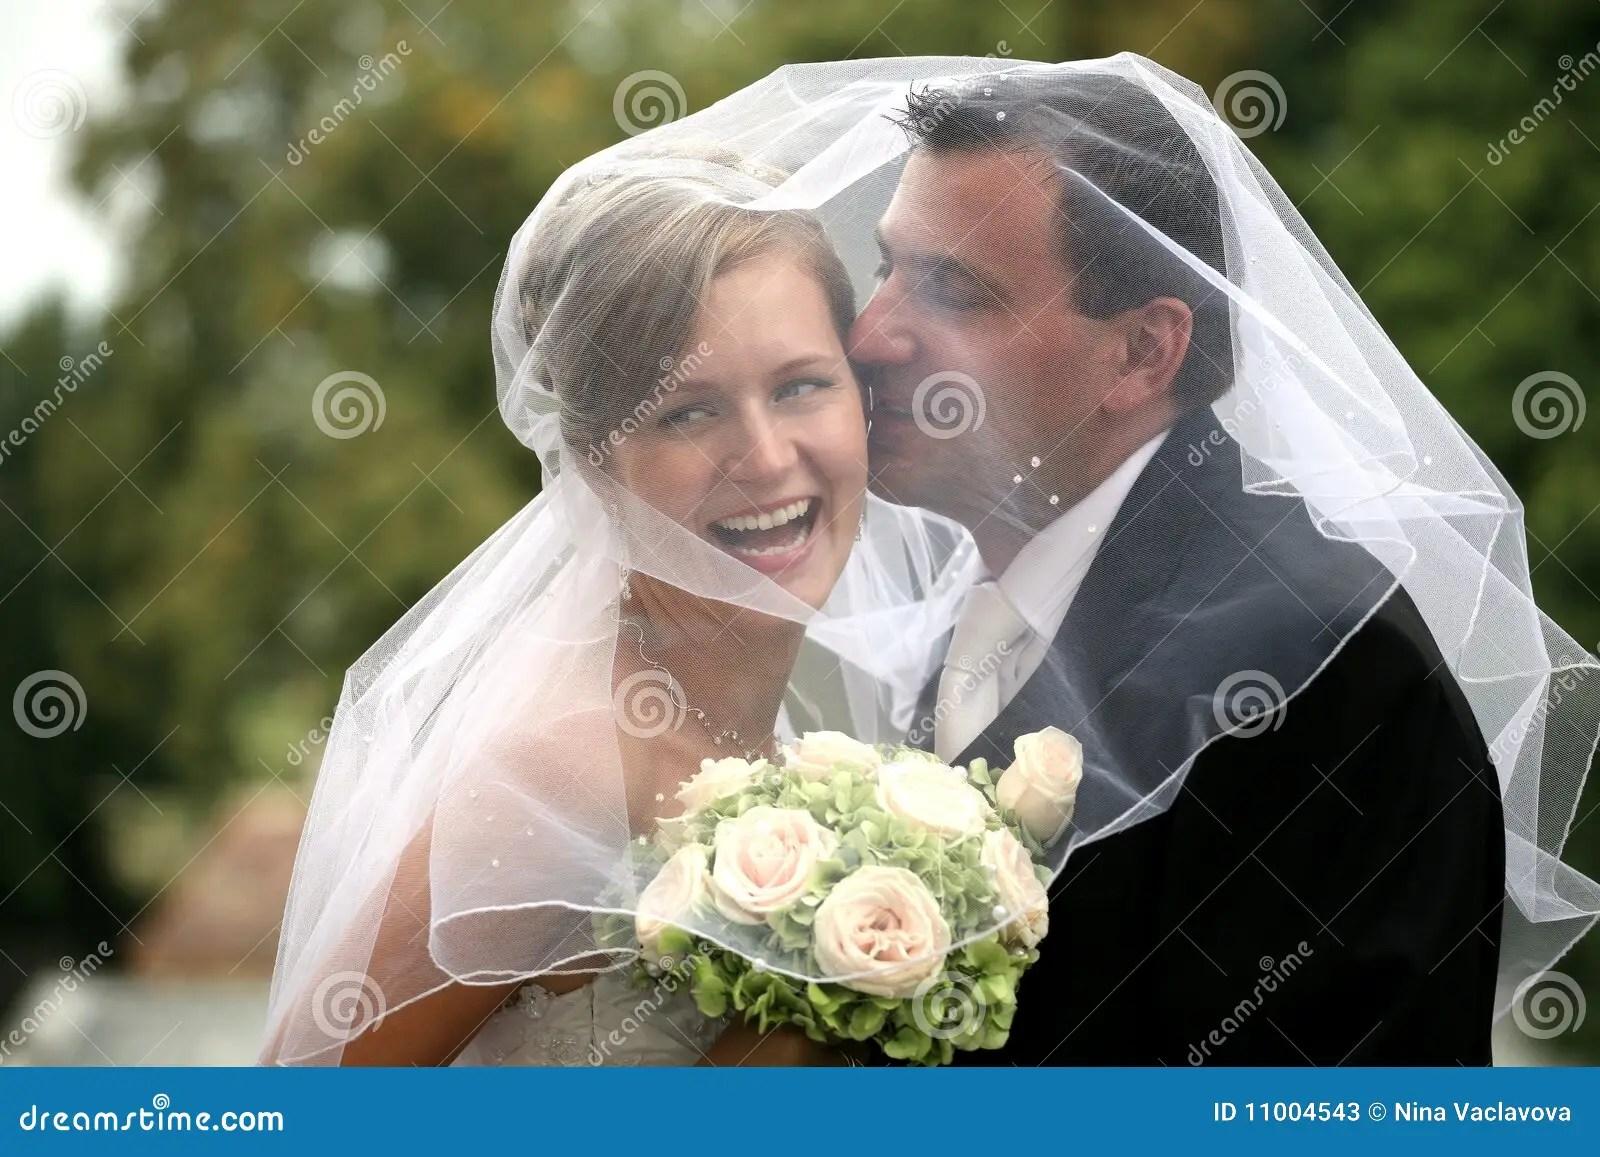 Wedding Couple Kissing Stock Image Image Of Hugging